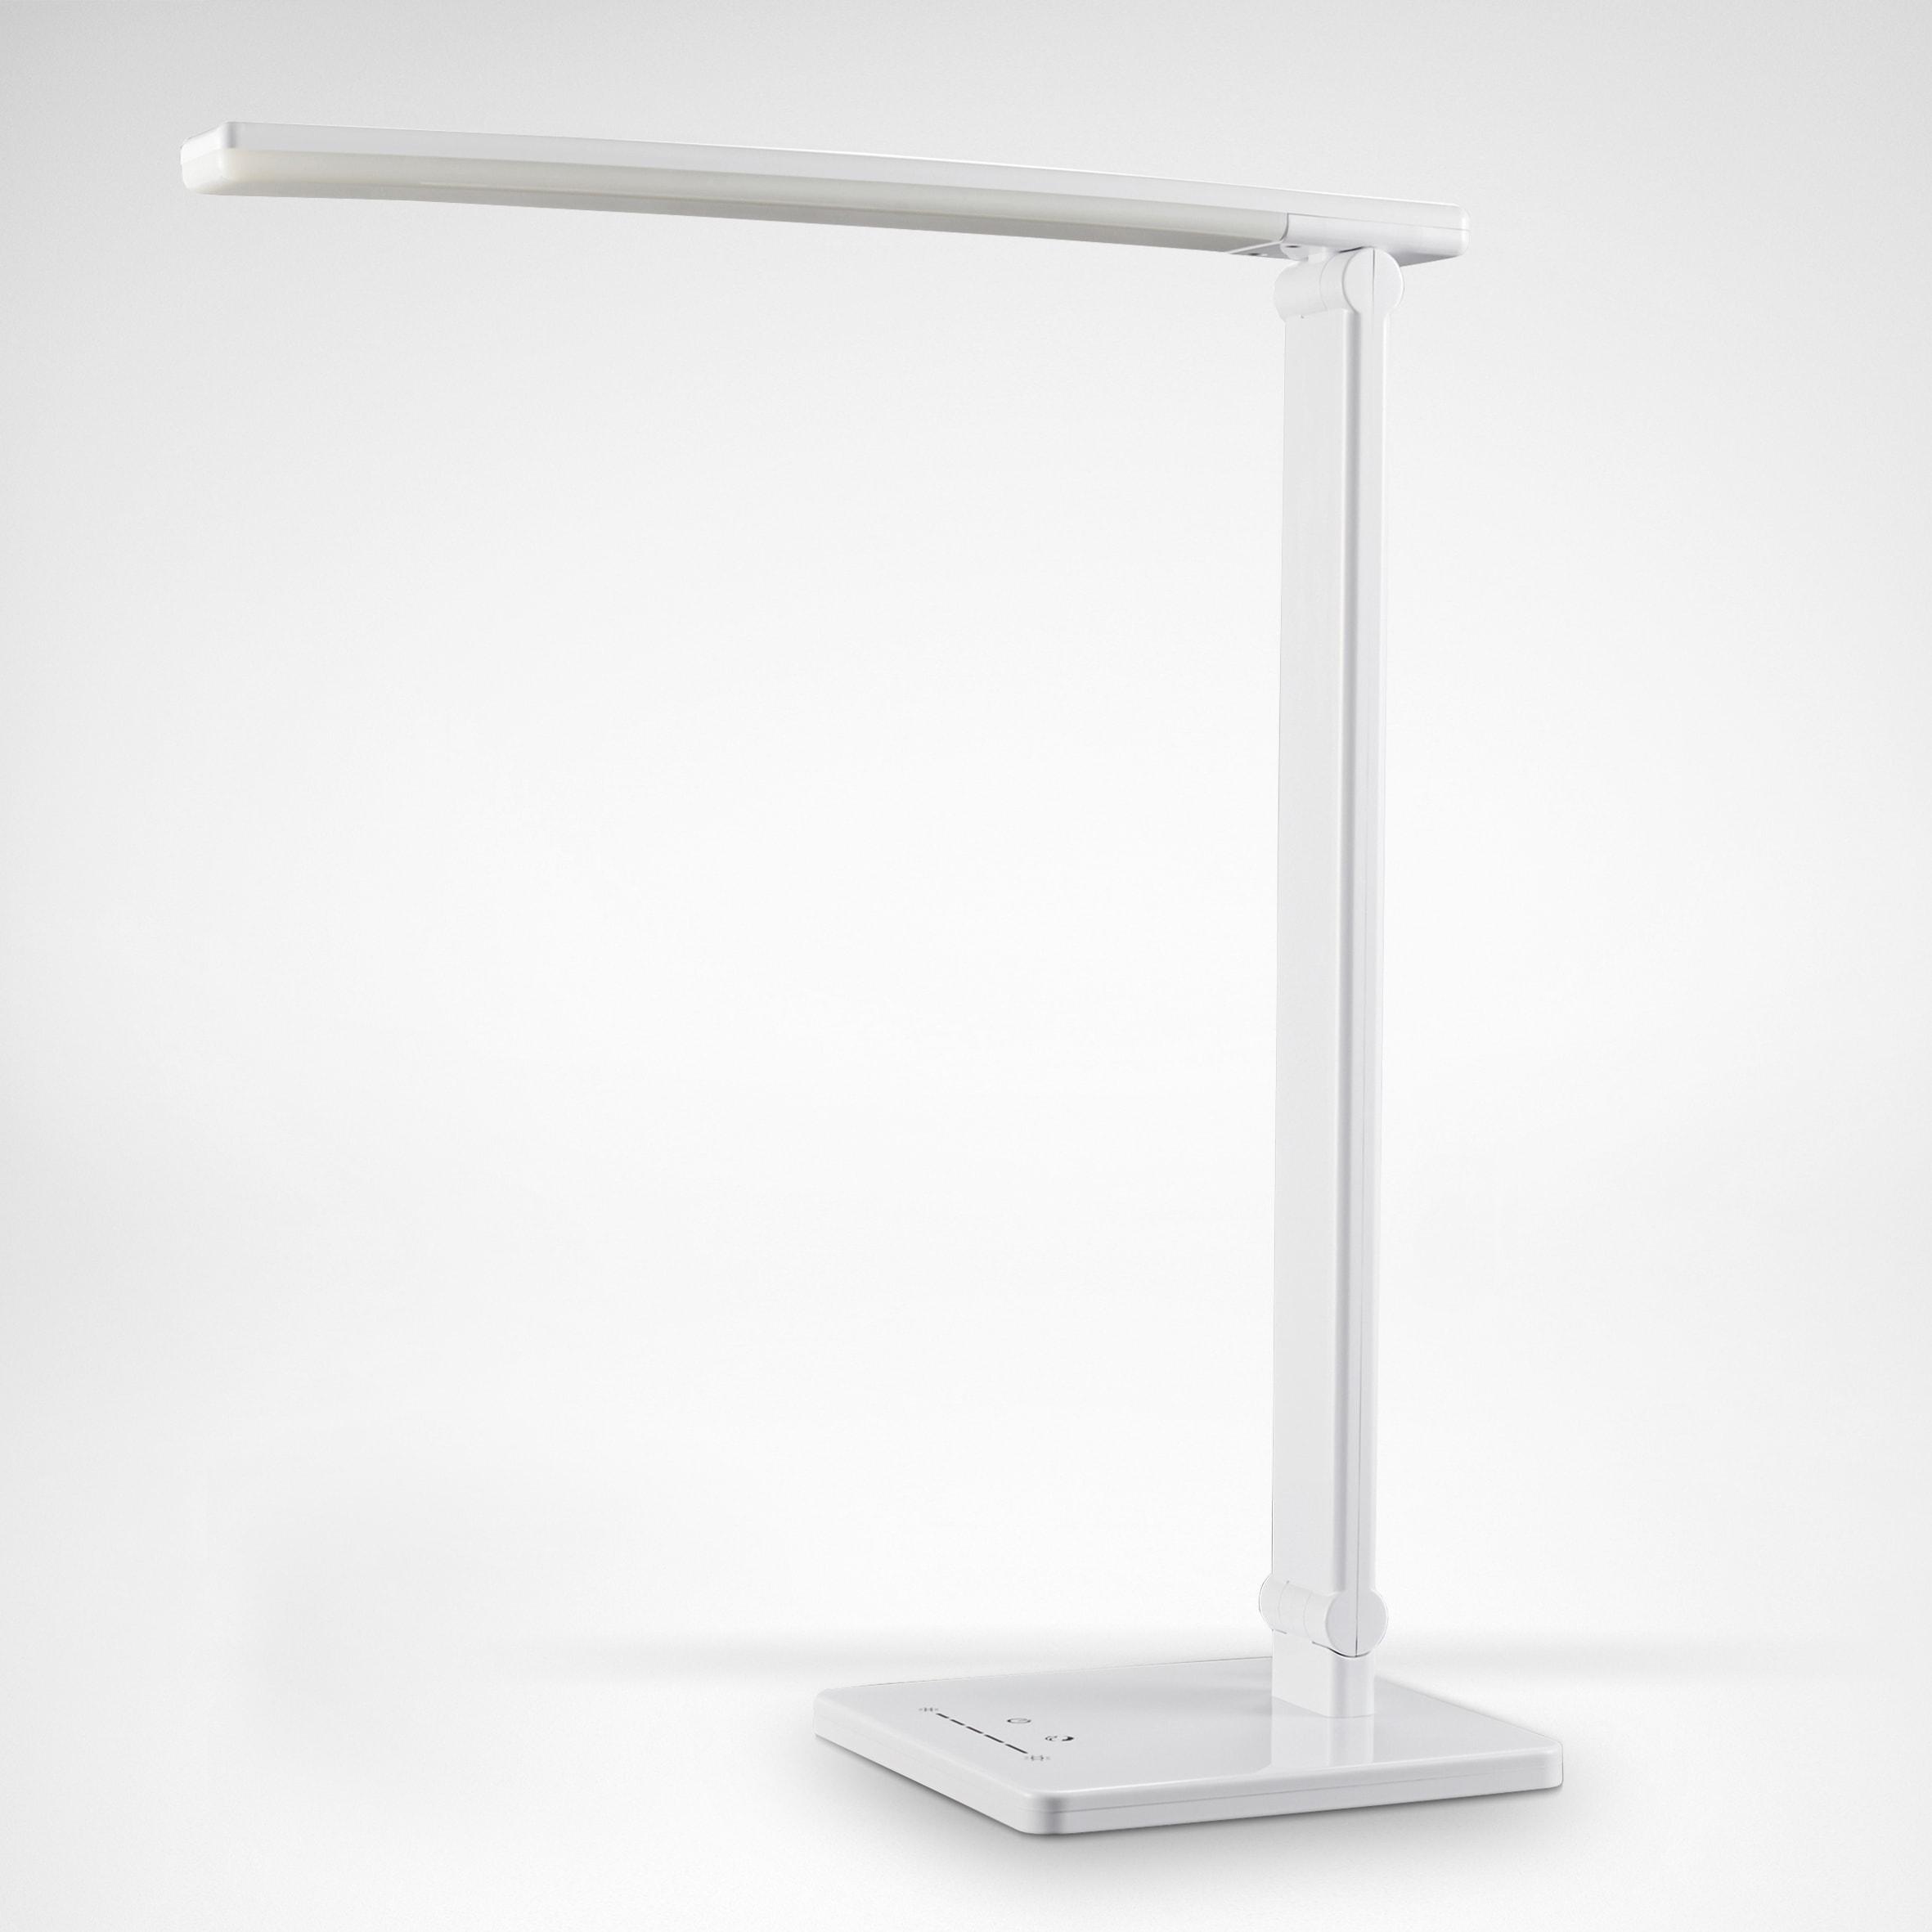 B.K.Licht,LED Tischleuchte Kilja